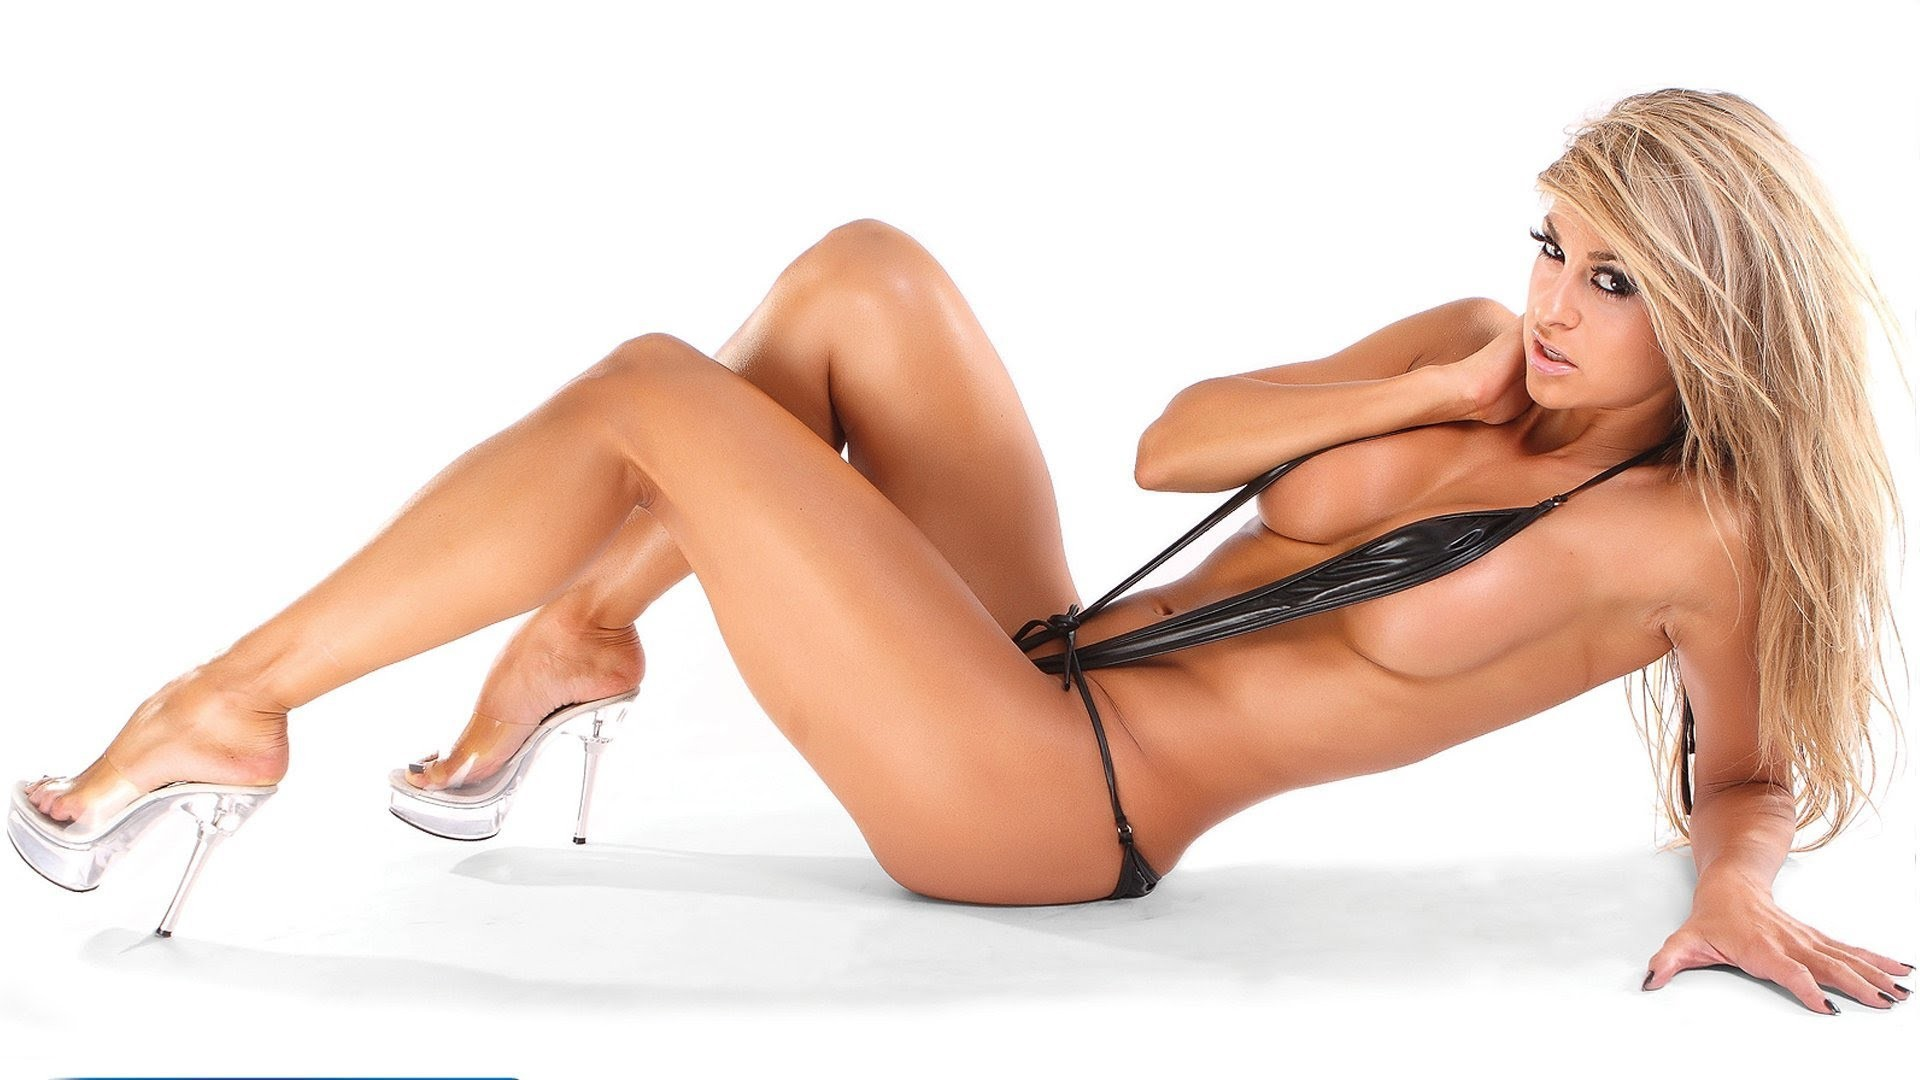 mandakini full nude boob and pusy photos